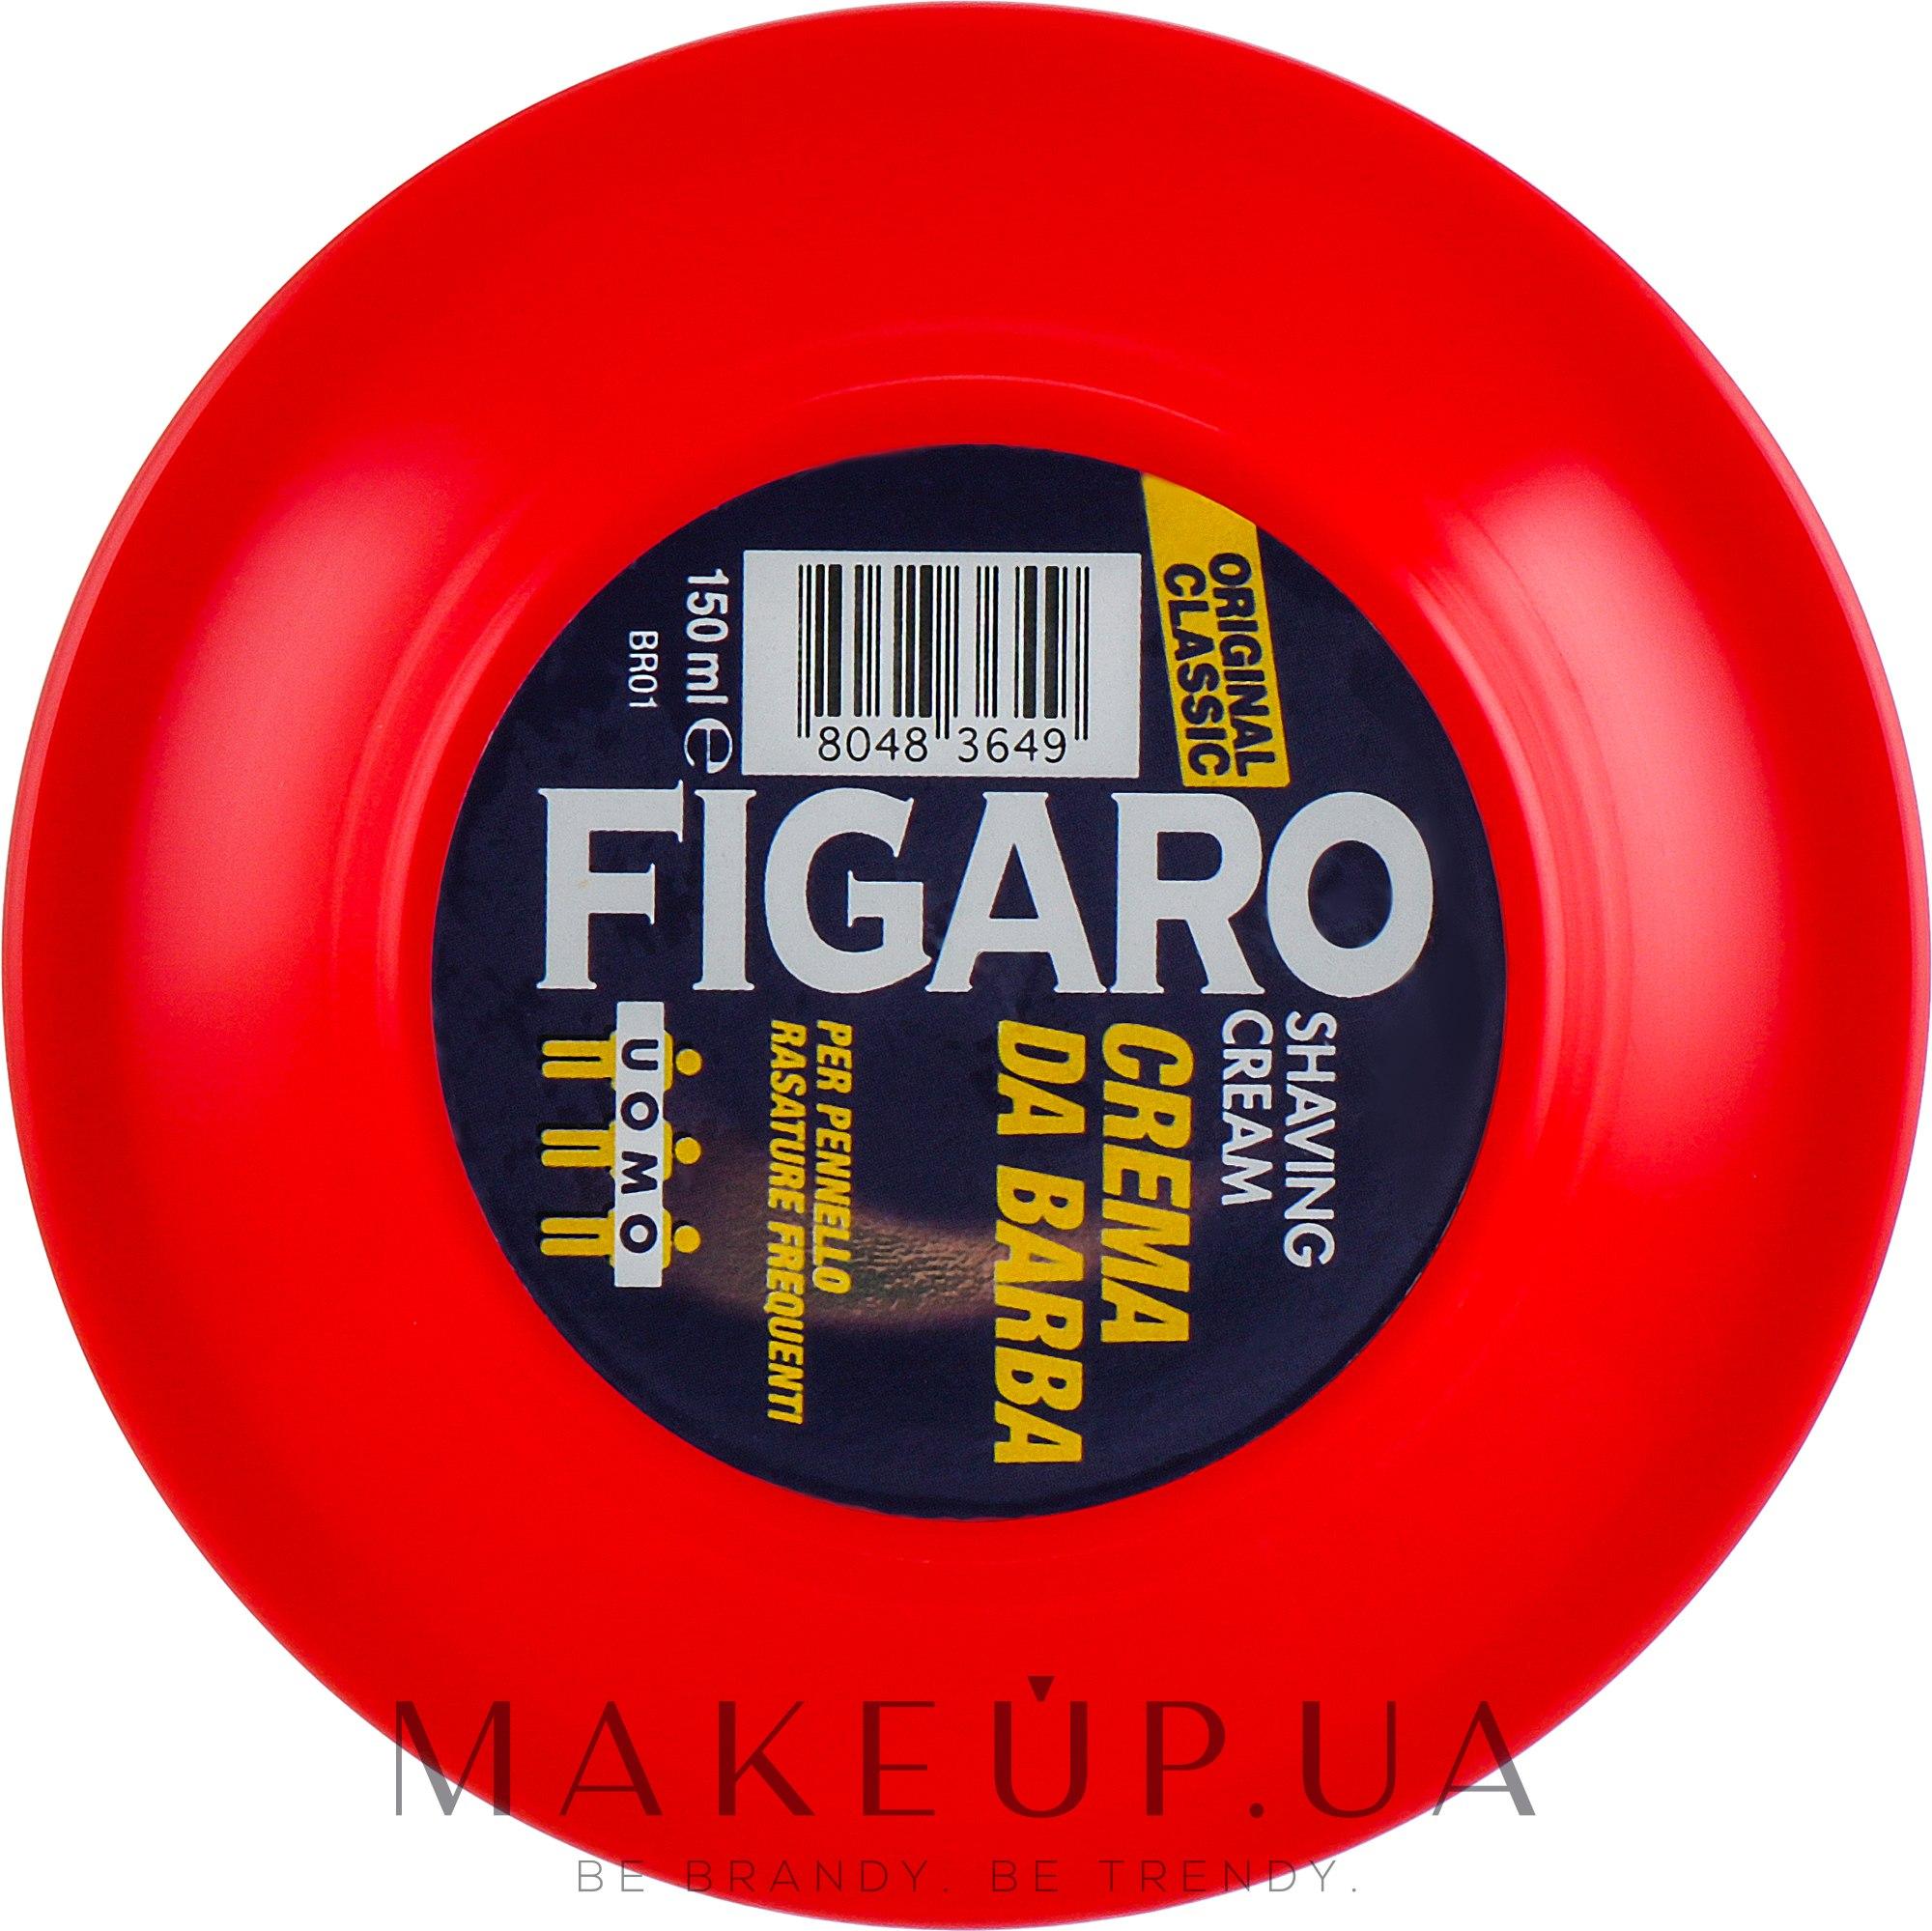 Крем для бритья - Mil Mil Figaro Shaving Cream — фото 150ml